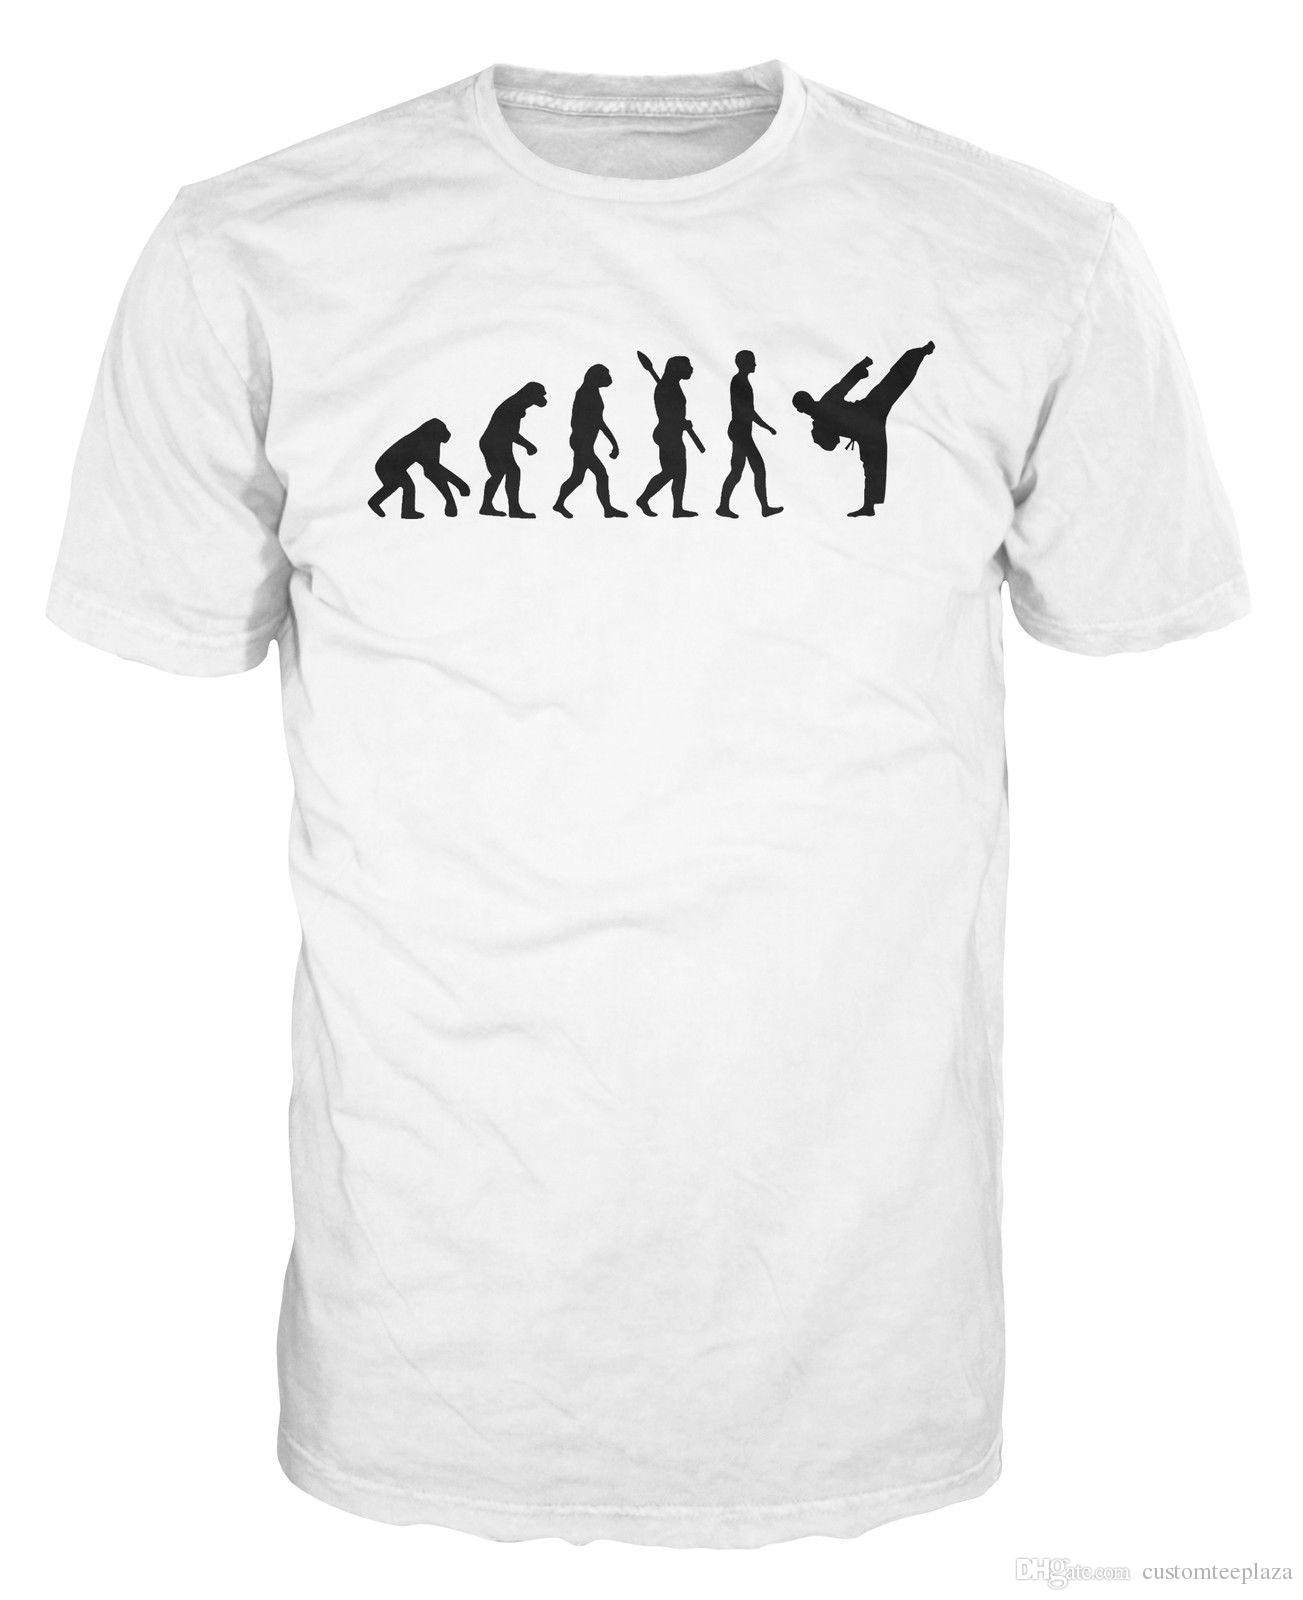 ec27529ee Karate Evolution Mma Martial Arts Taekwondo Funny T Shirt Tee Shirts Short  Sleeved Fashion Designer T Shirt Couple XXXL Size Best Funny Shirts Funny  Print ...